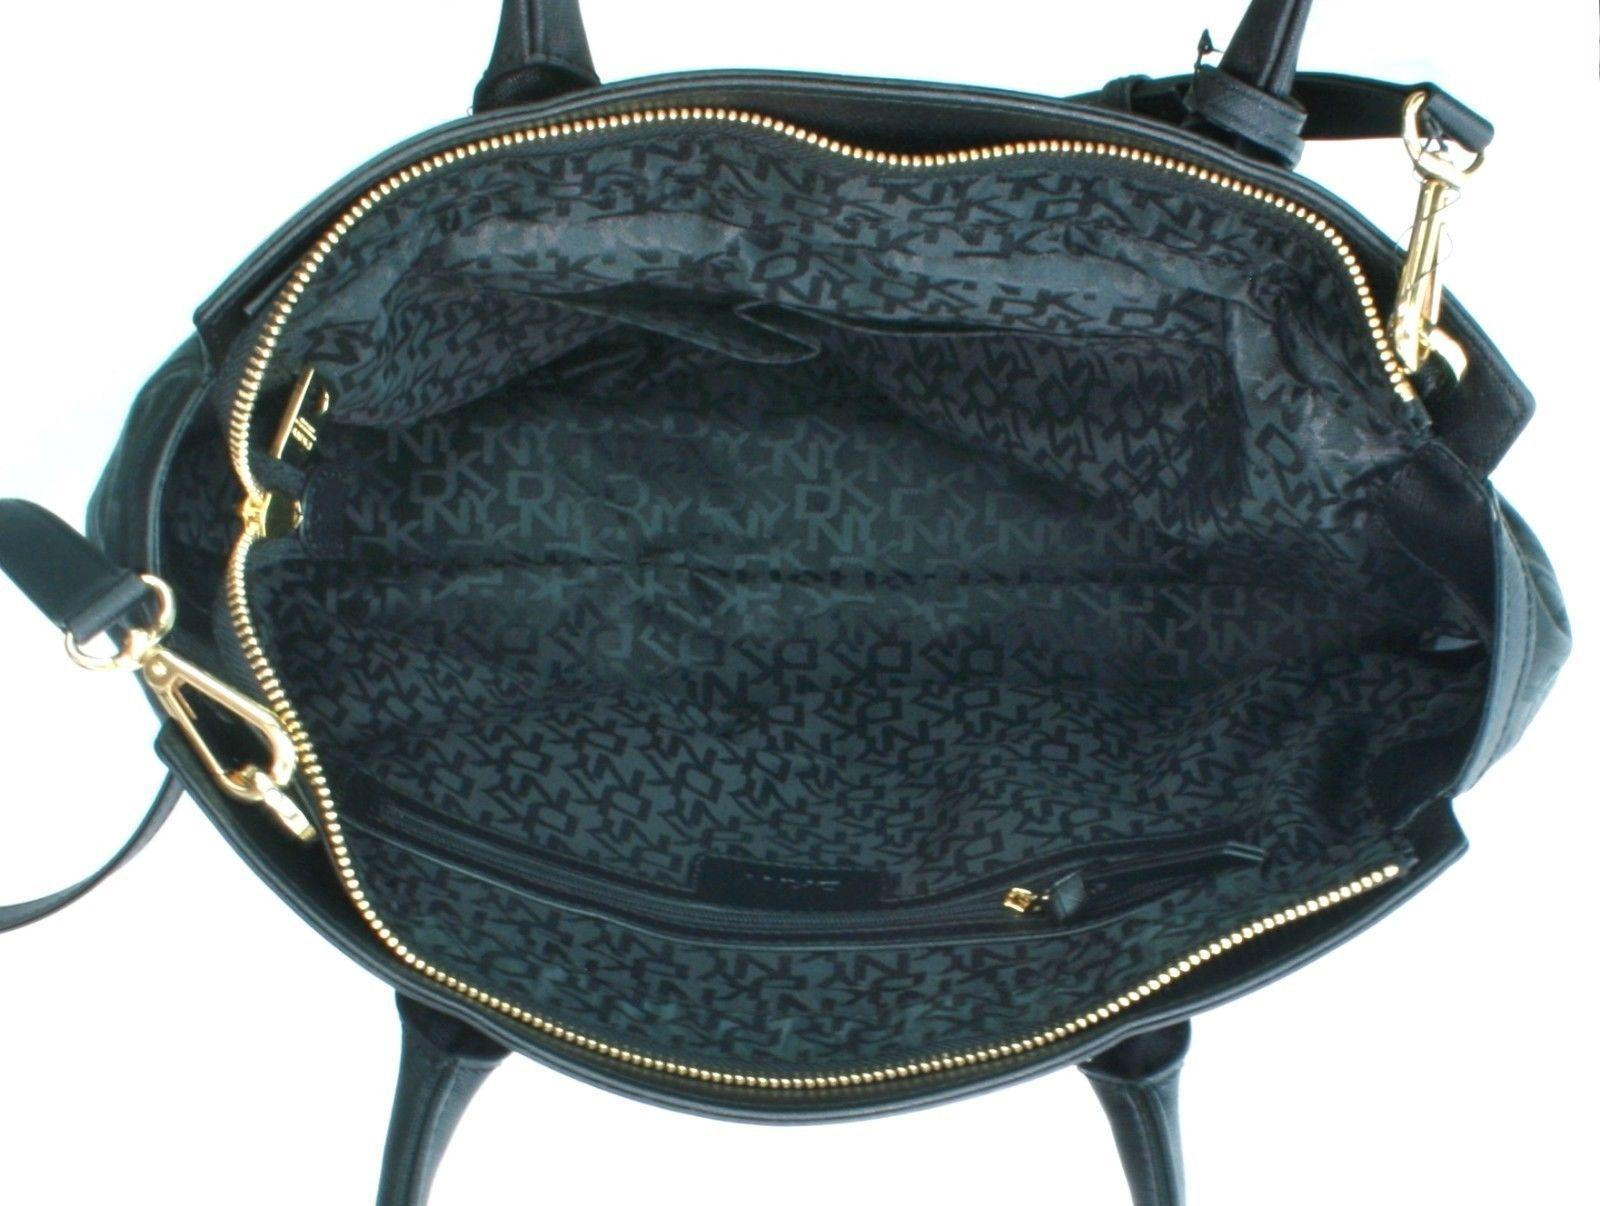 DKNY Donna Karan Heritage Black Leather Canvas Tote Cross Body Bag Handbag